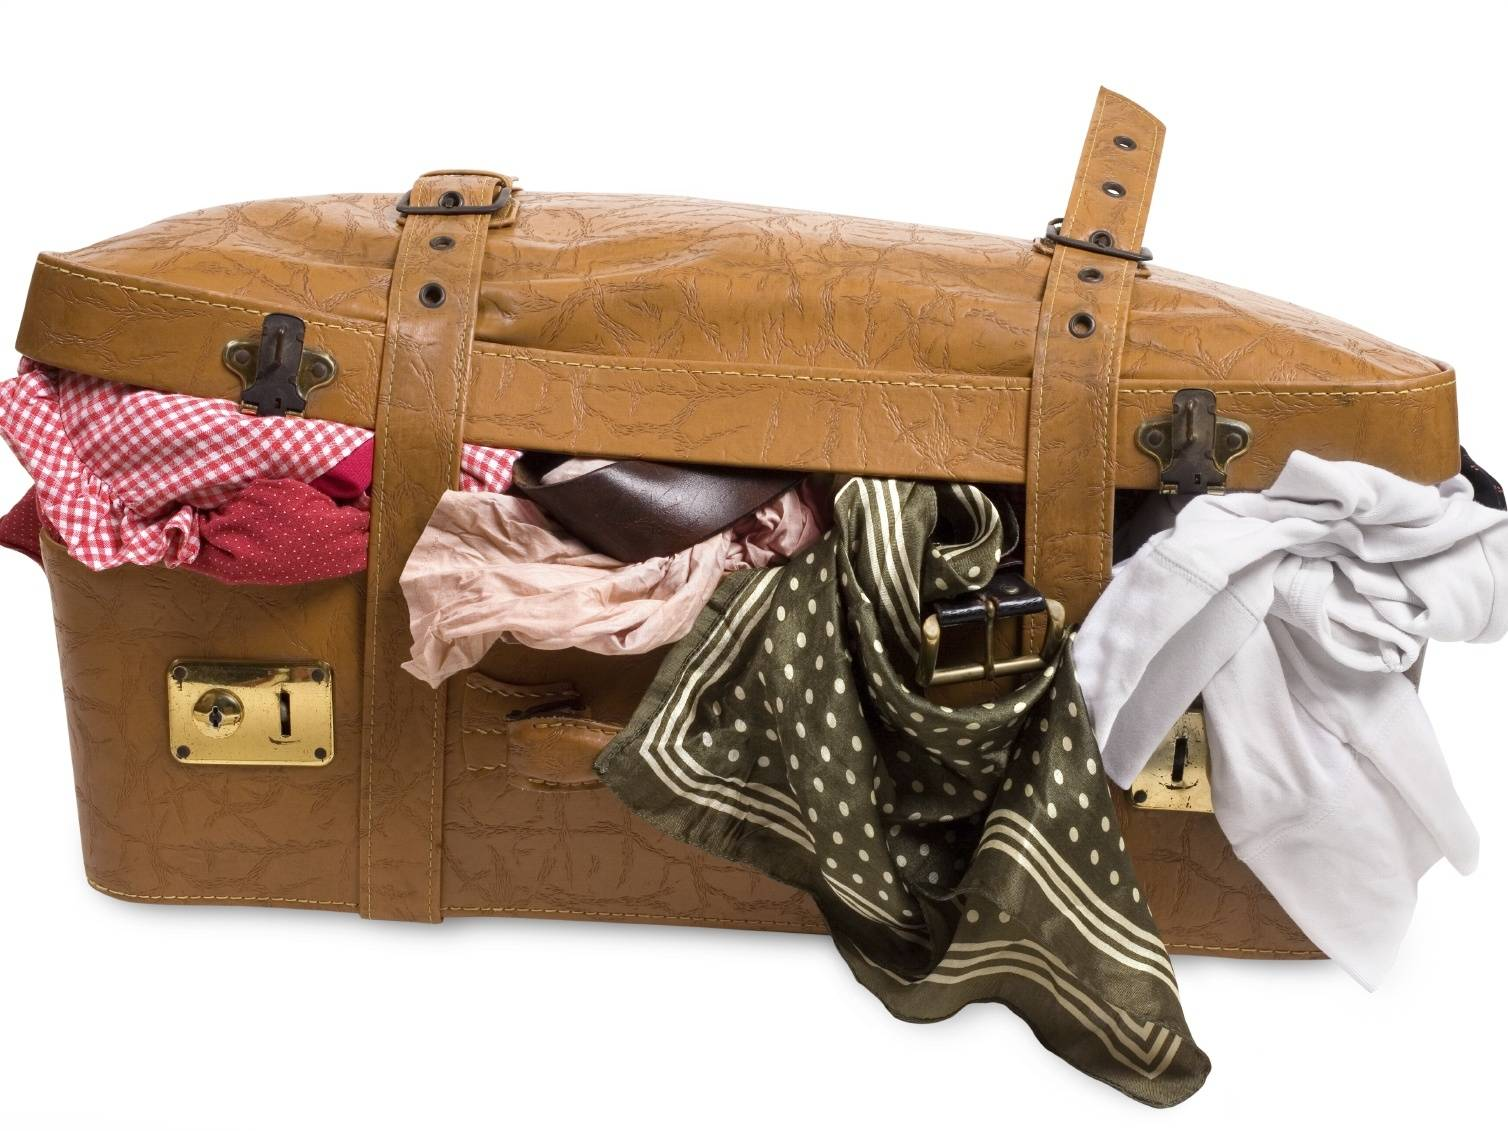 28 incredibly useful packing hacks